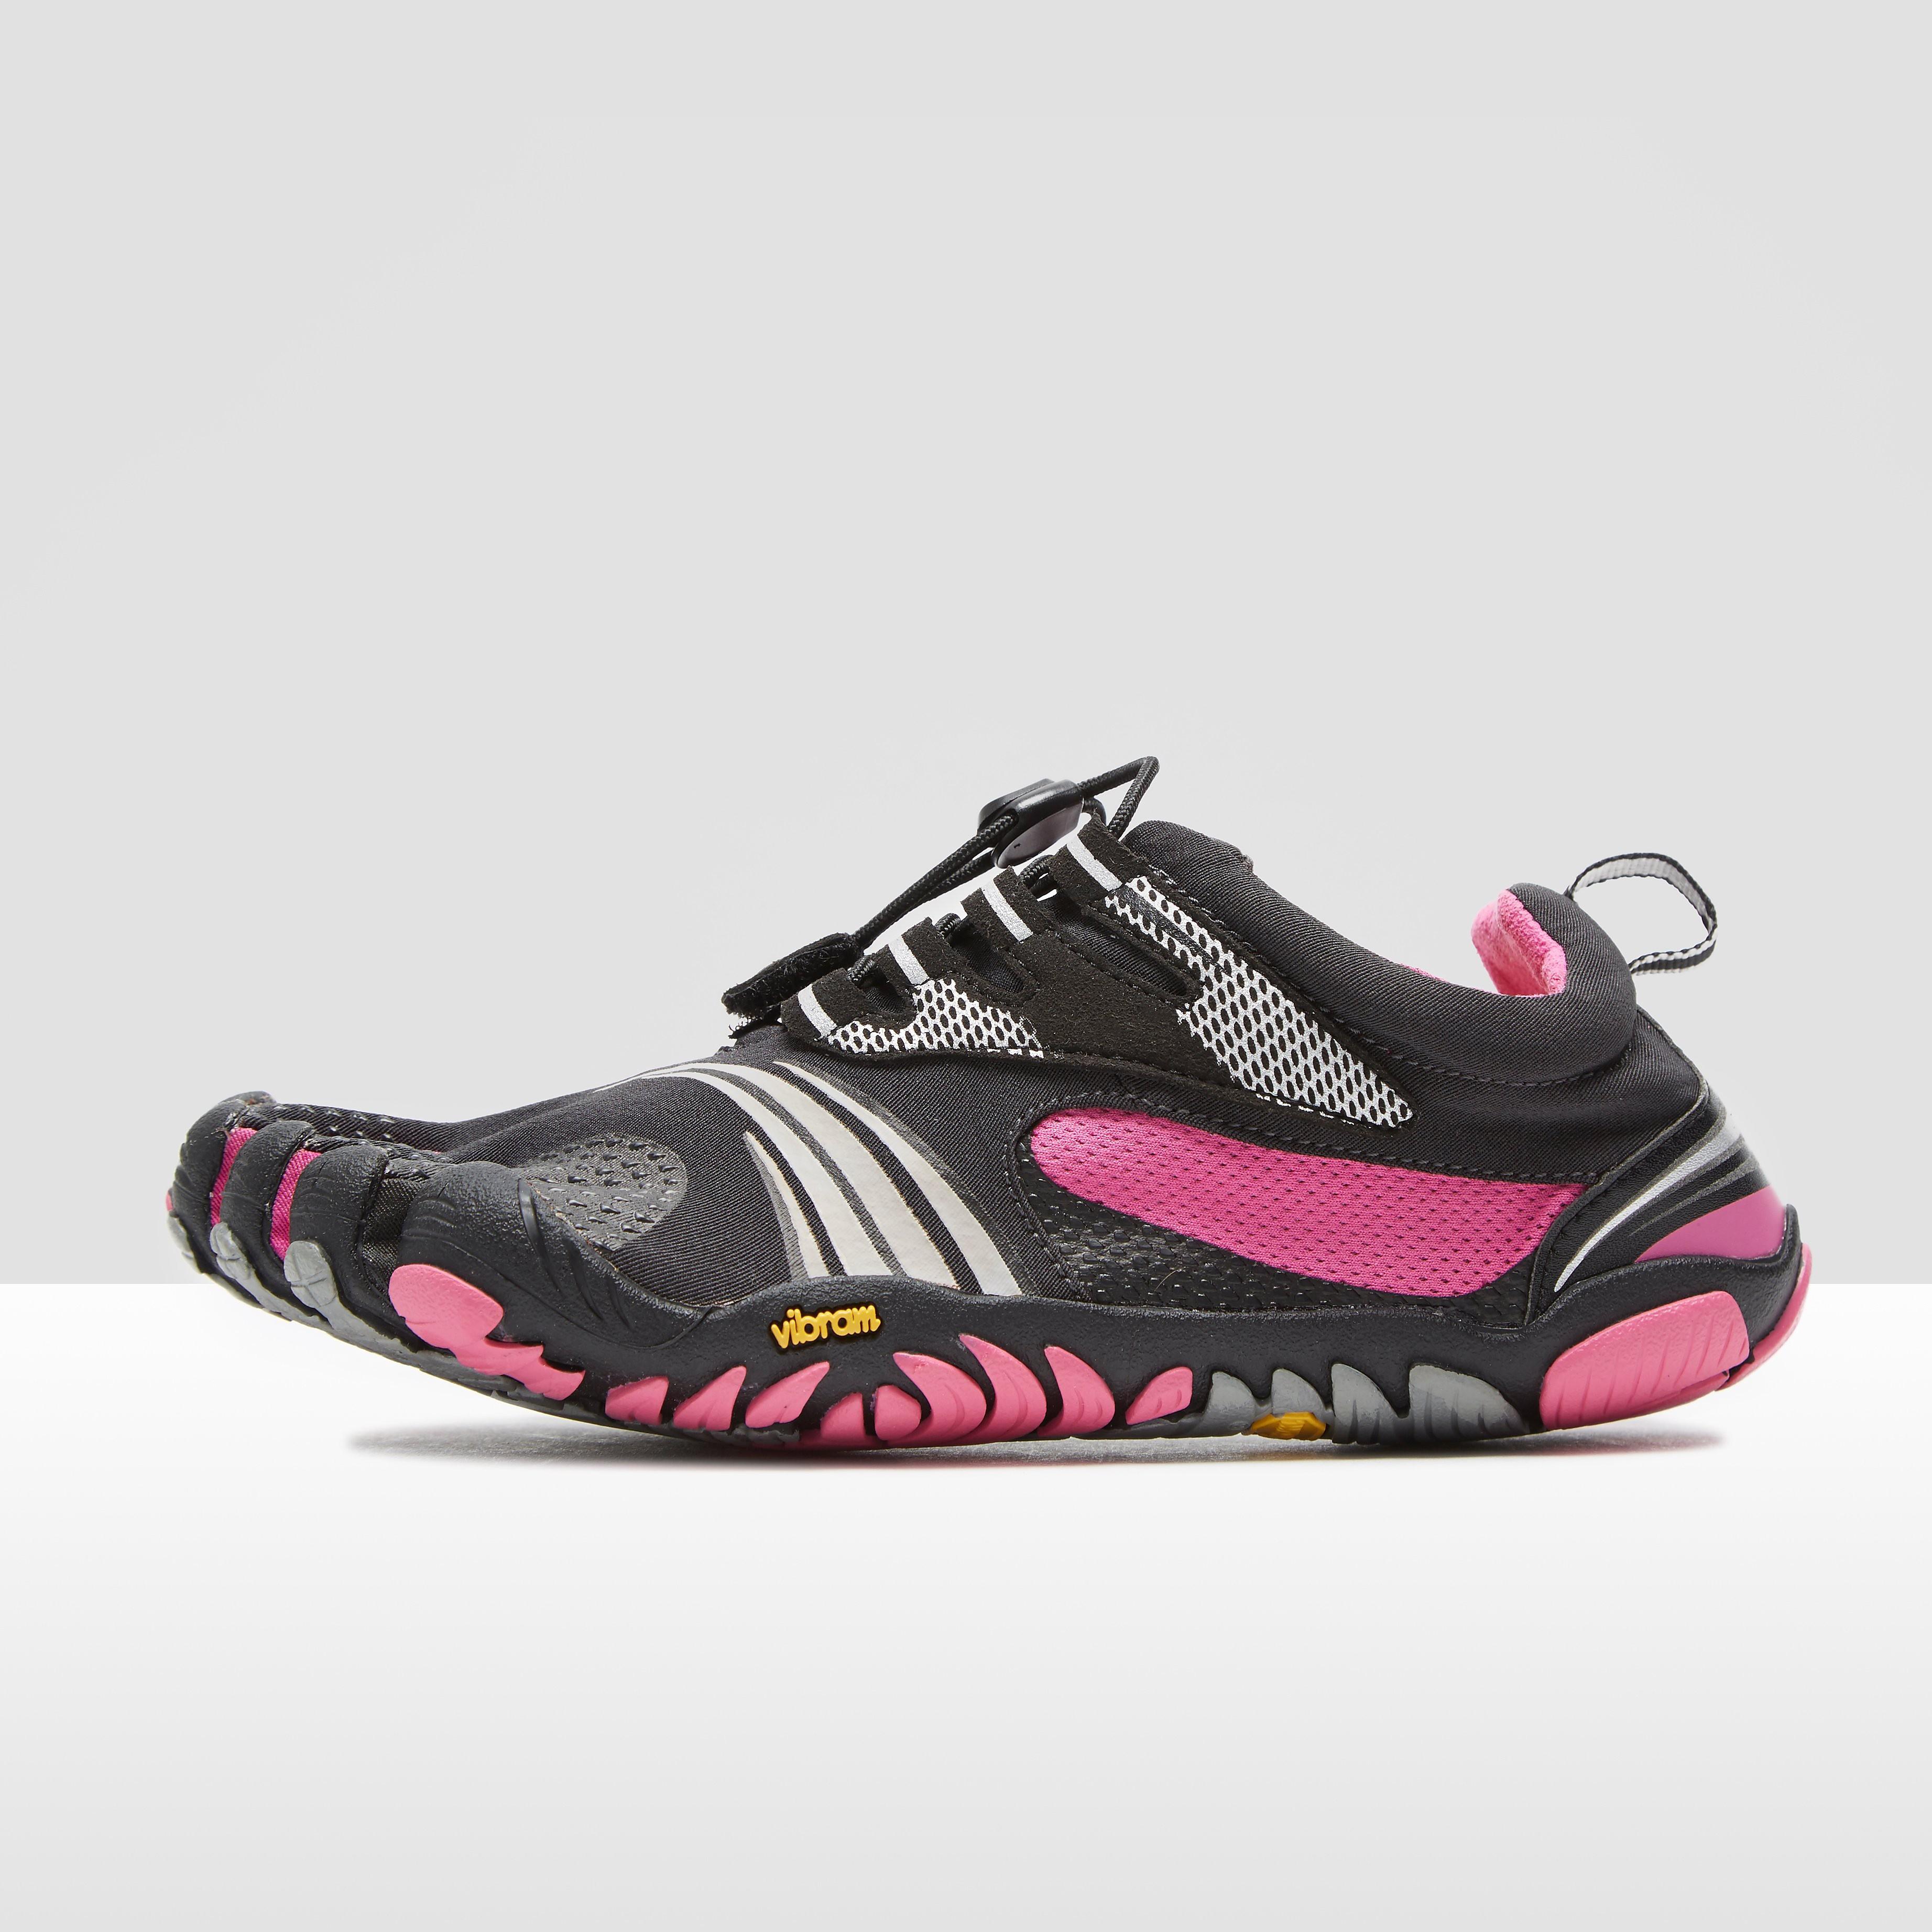 Vibram Five Fingers KMD Sport LS Ladies Running Shoe